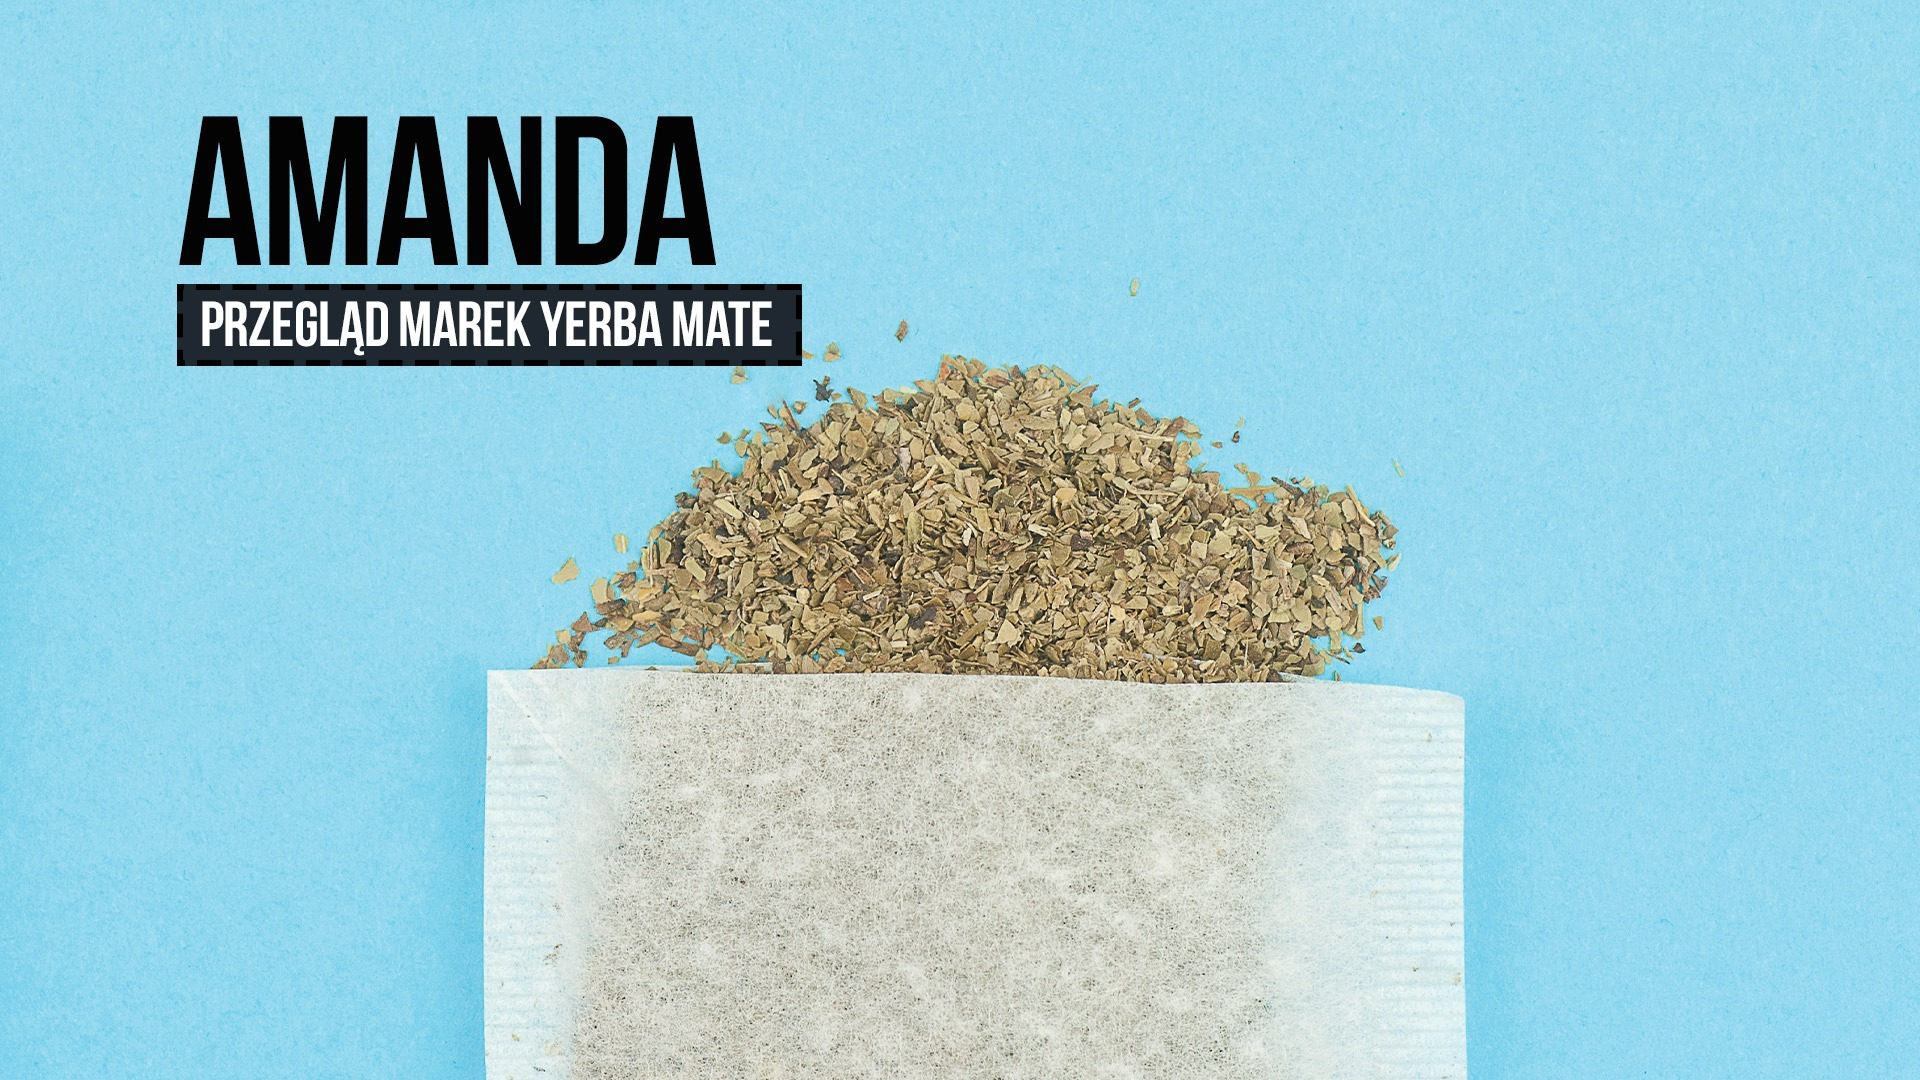 Przegląd yerba mate: Amanda (ostrokrzew paragwajski)